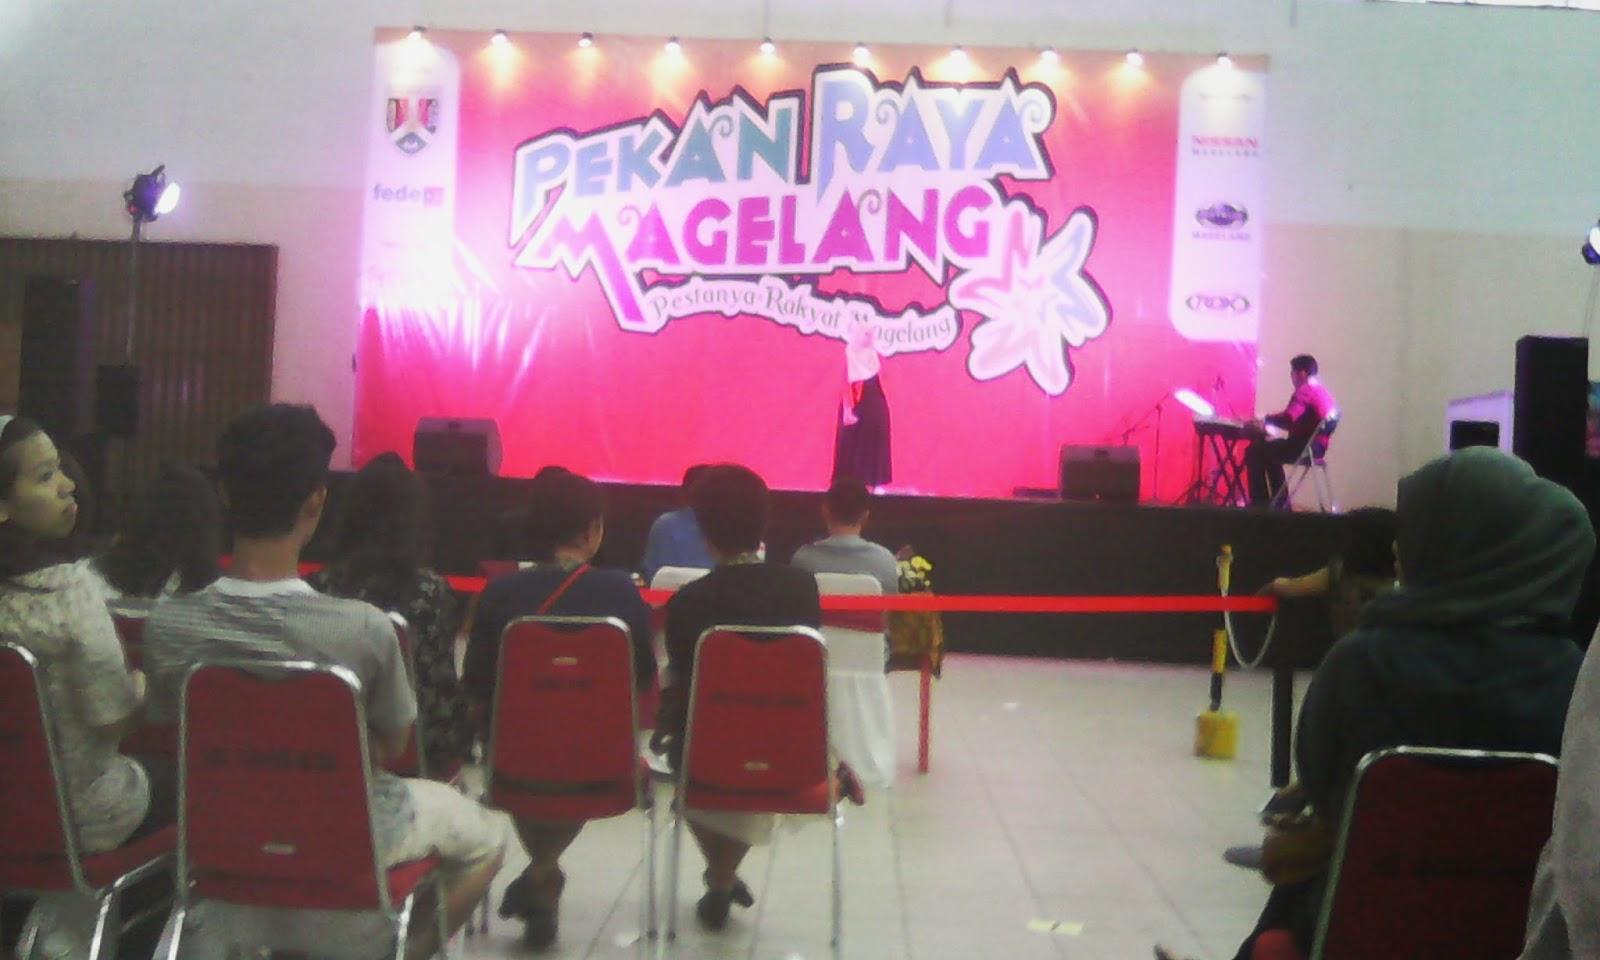 Dari Pekan raya Magelang 2014